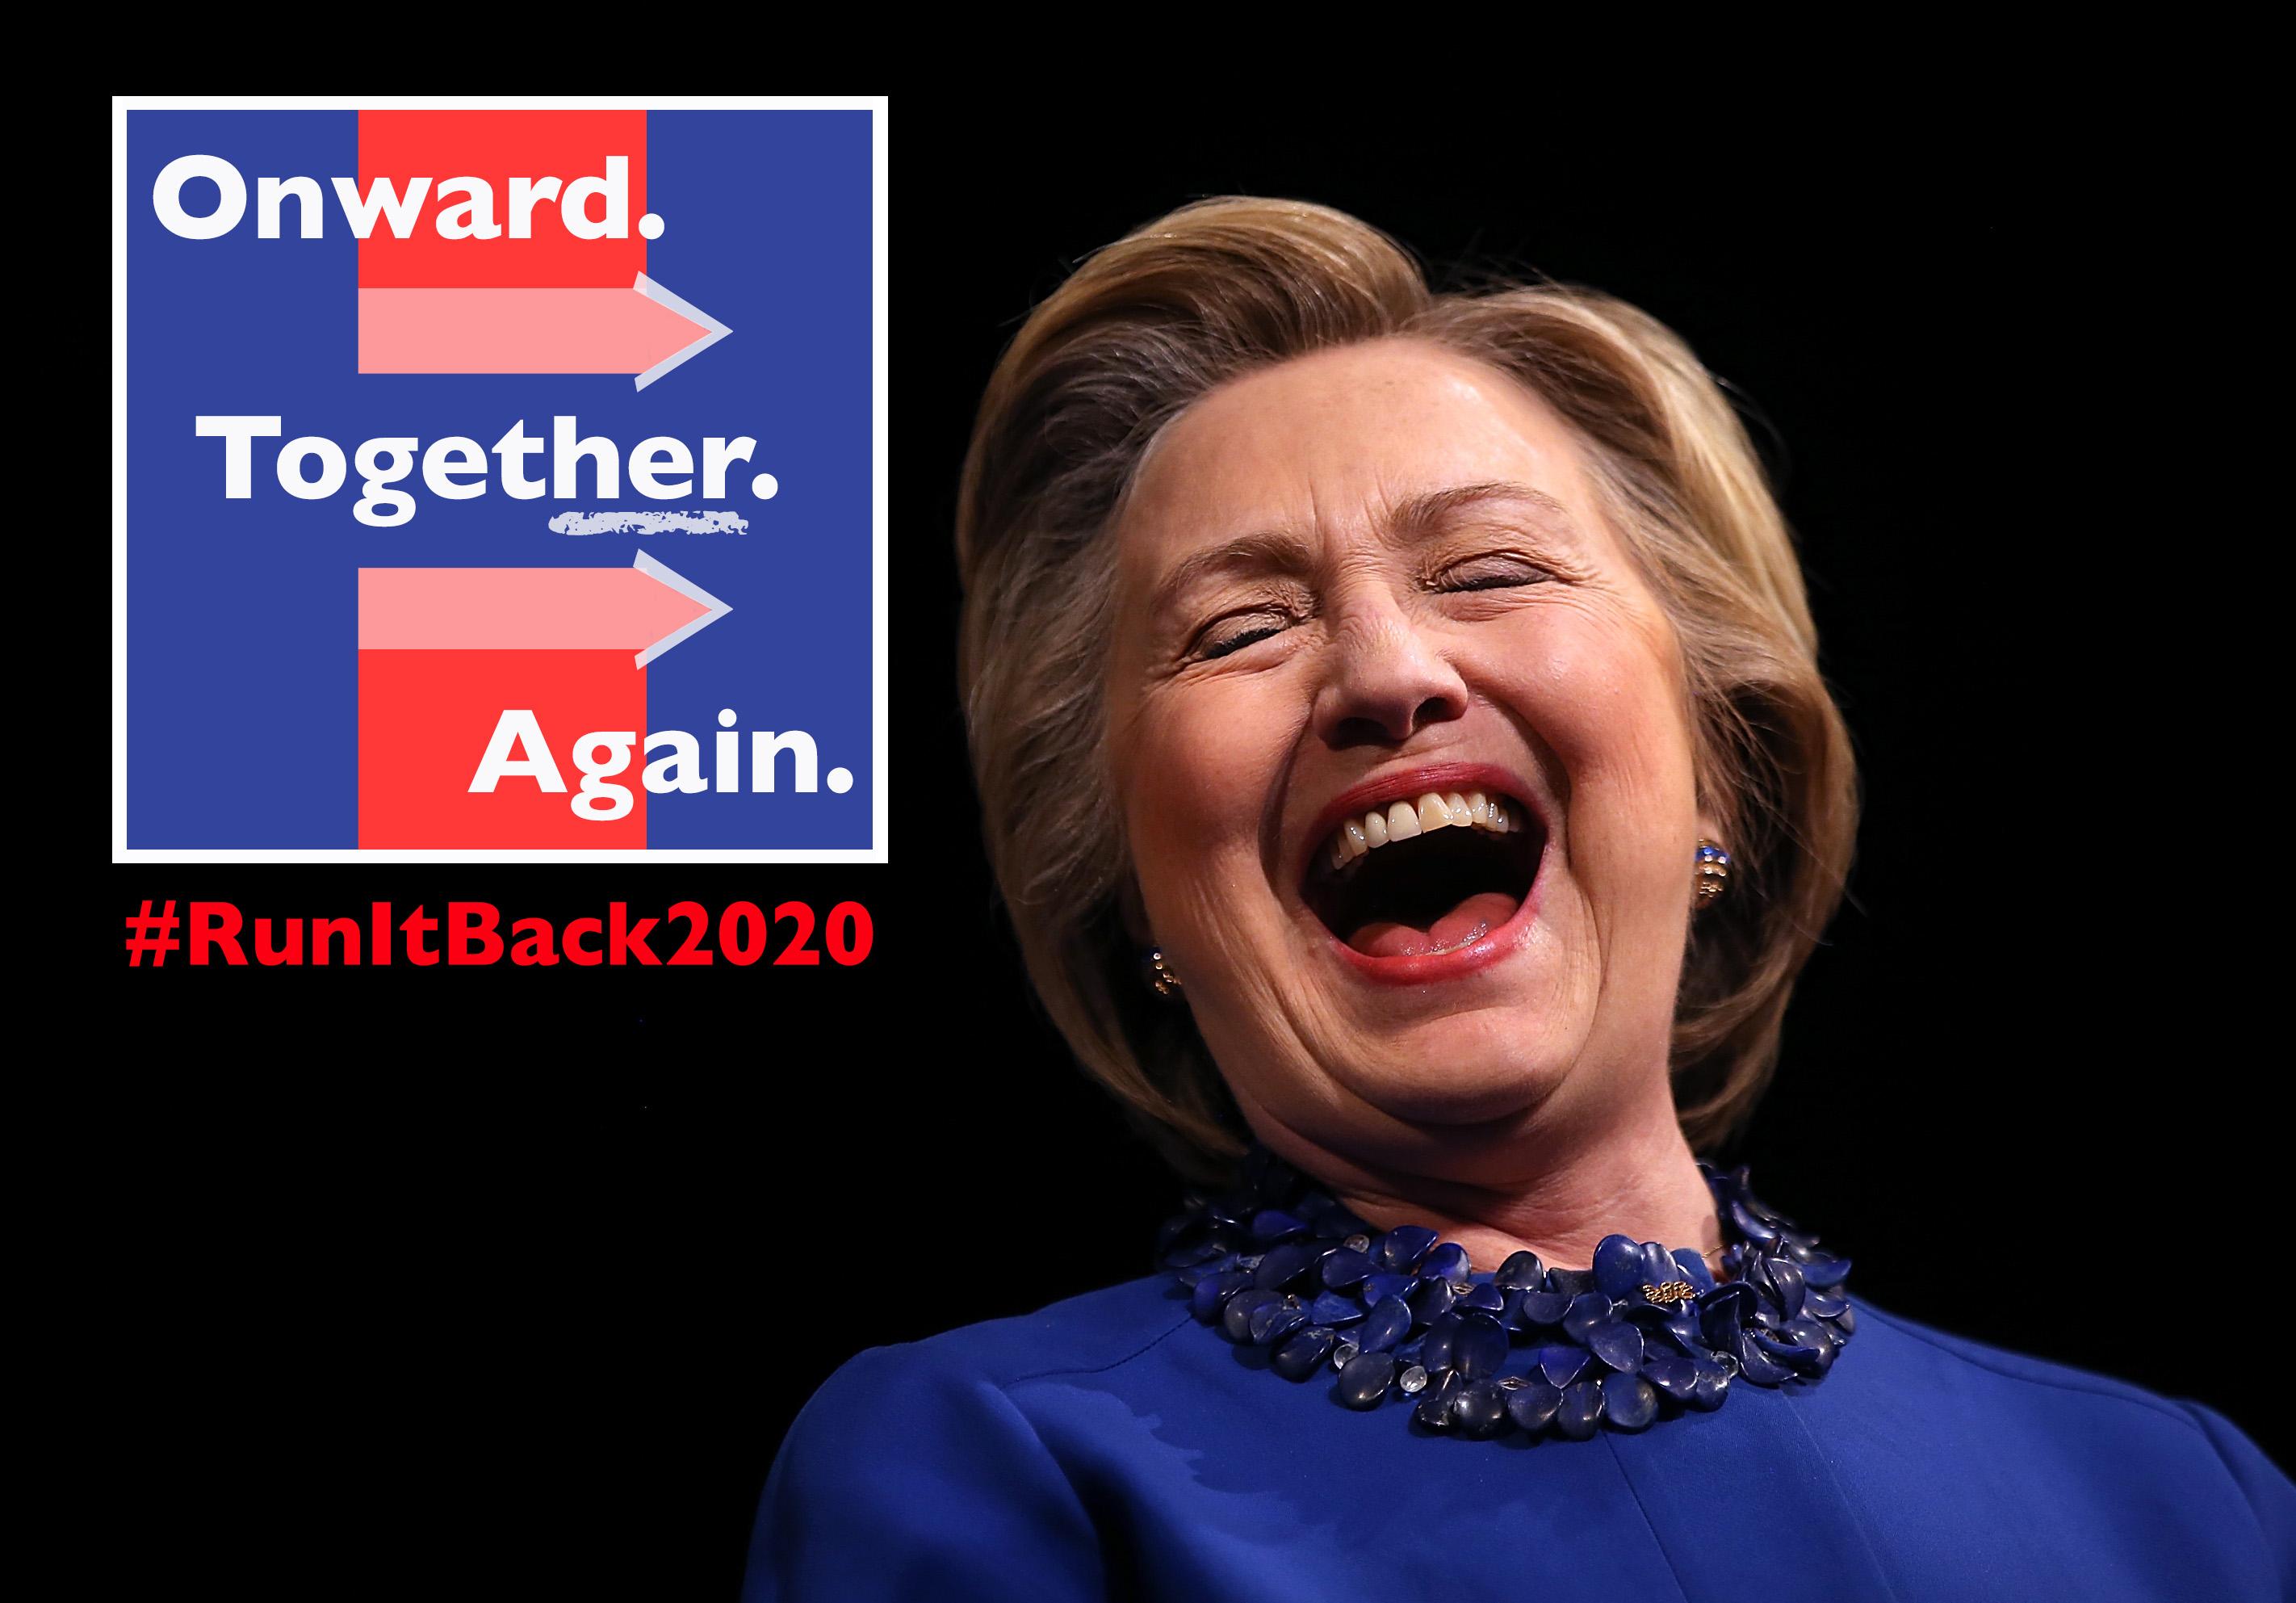 FLASHFORWARD Hillary Clinton Announces 2020 Presidential